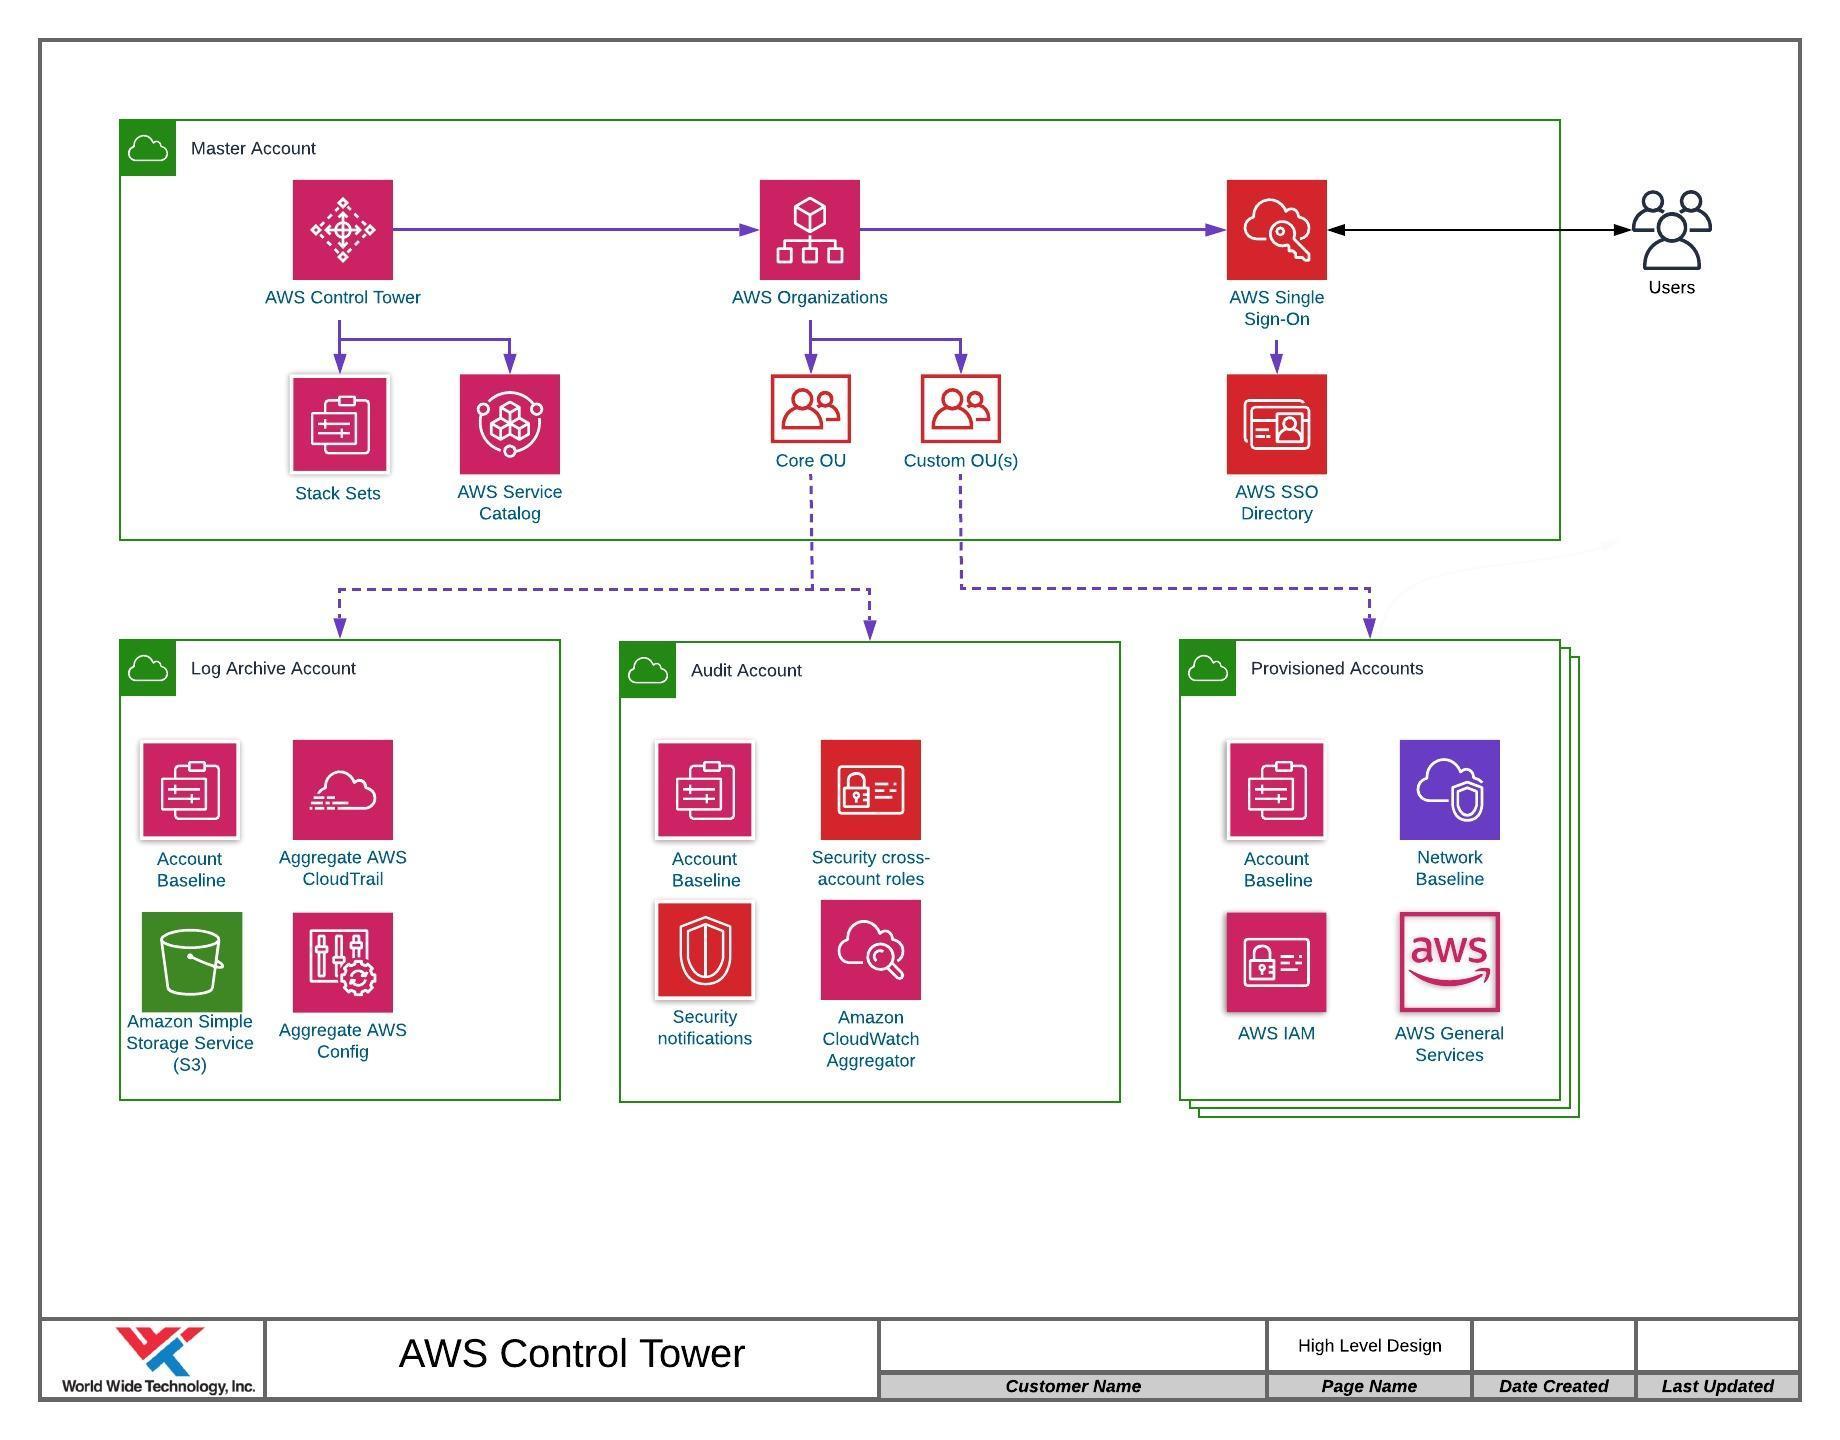 Diagram of AWS Control Tower